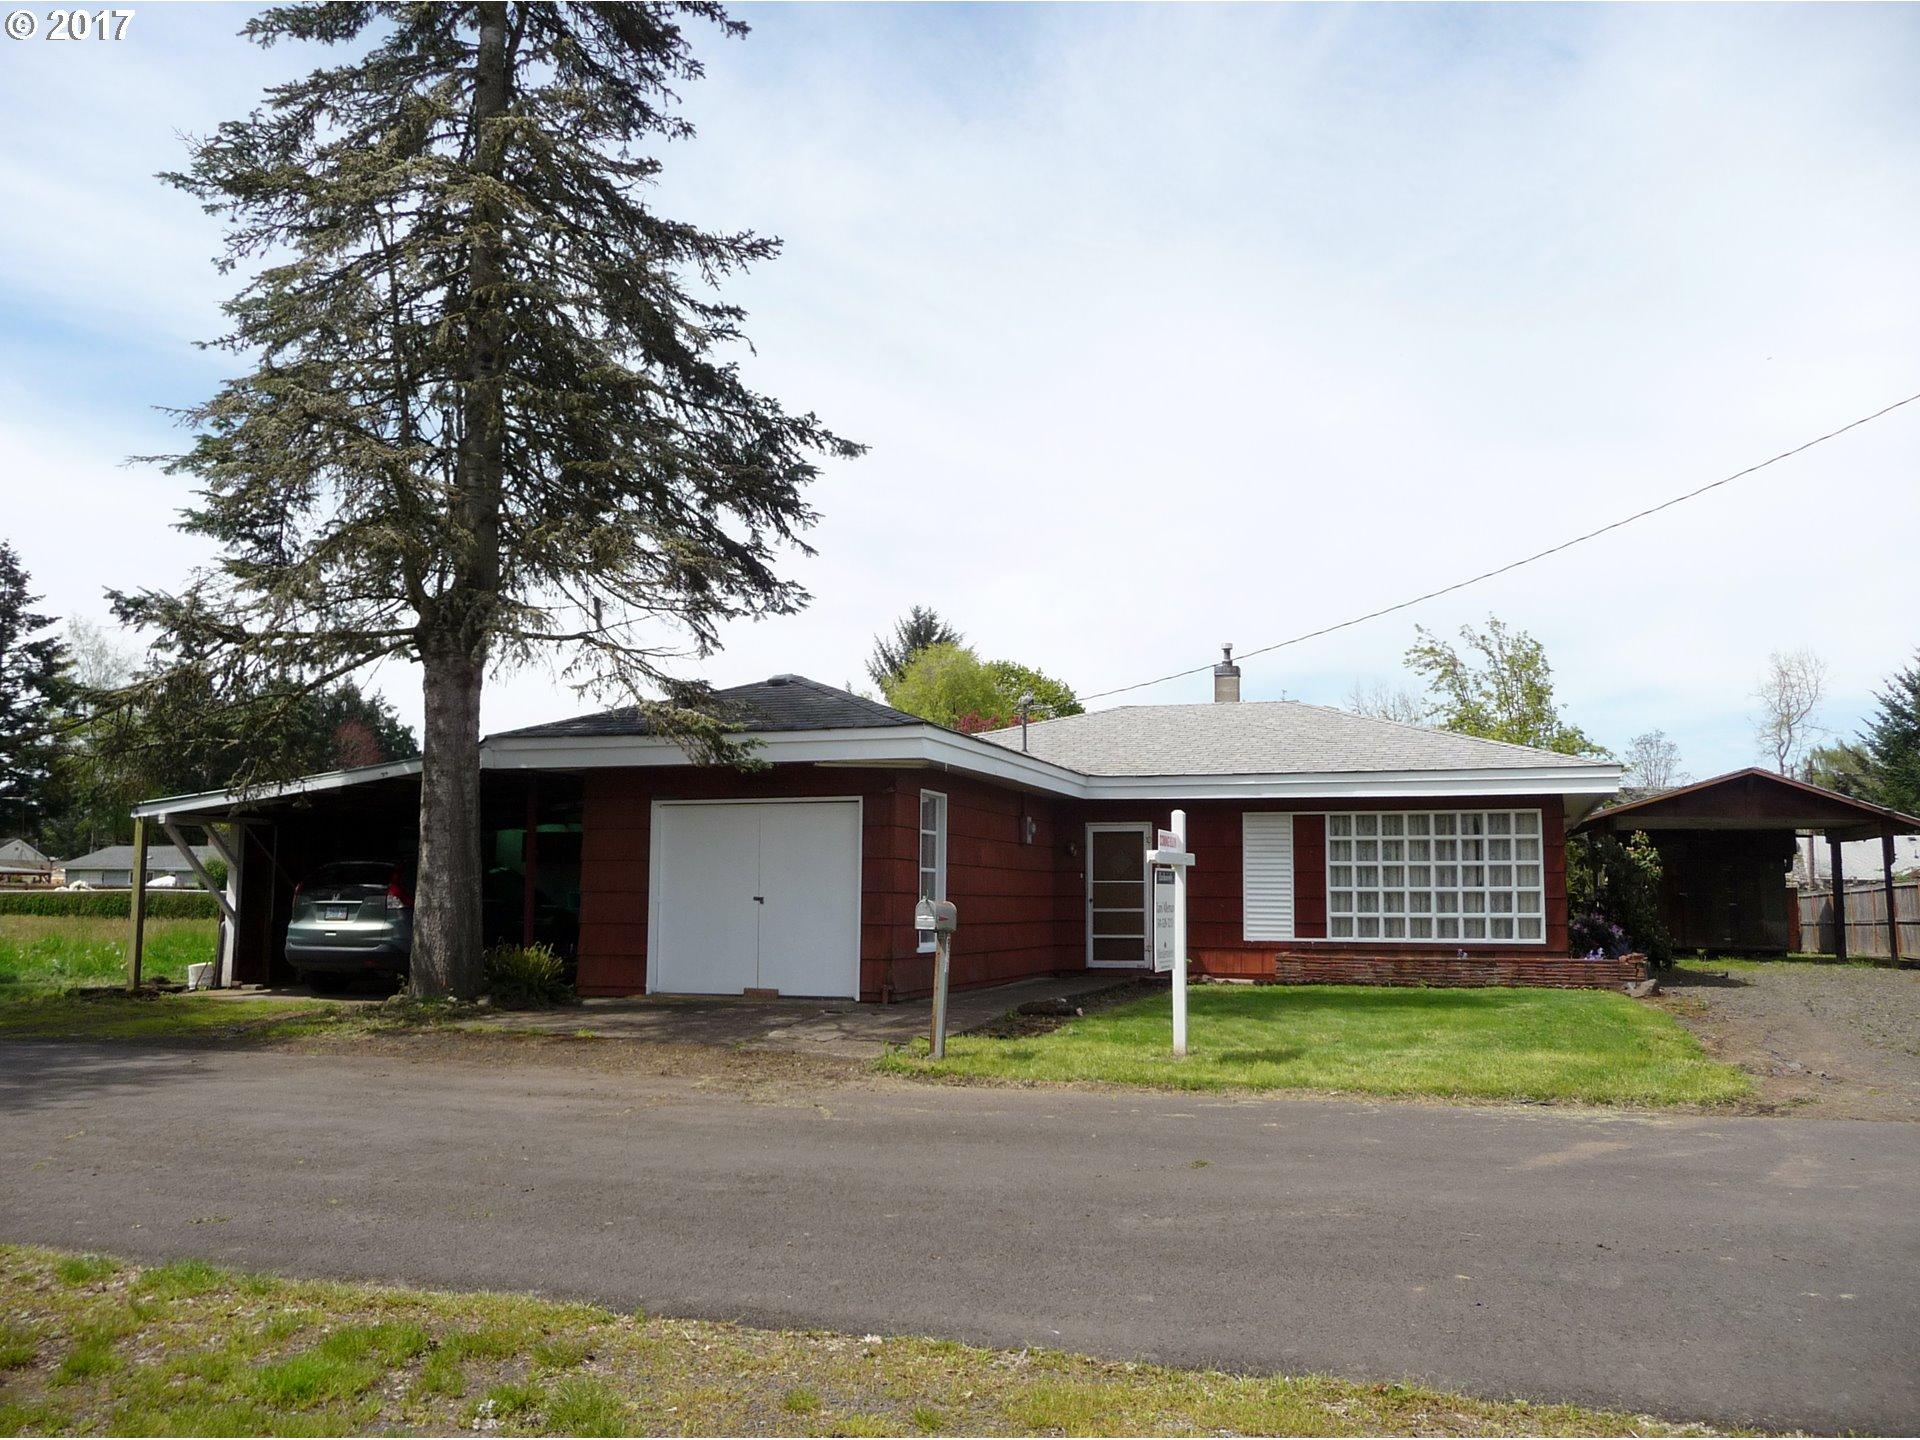 921 ROSE ST, Junction City, OR 97448